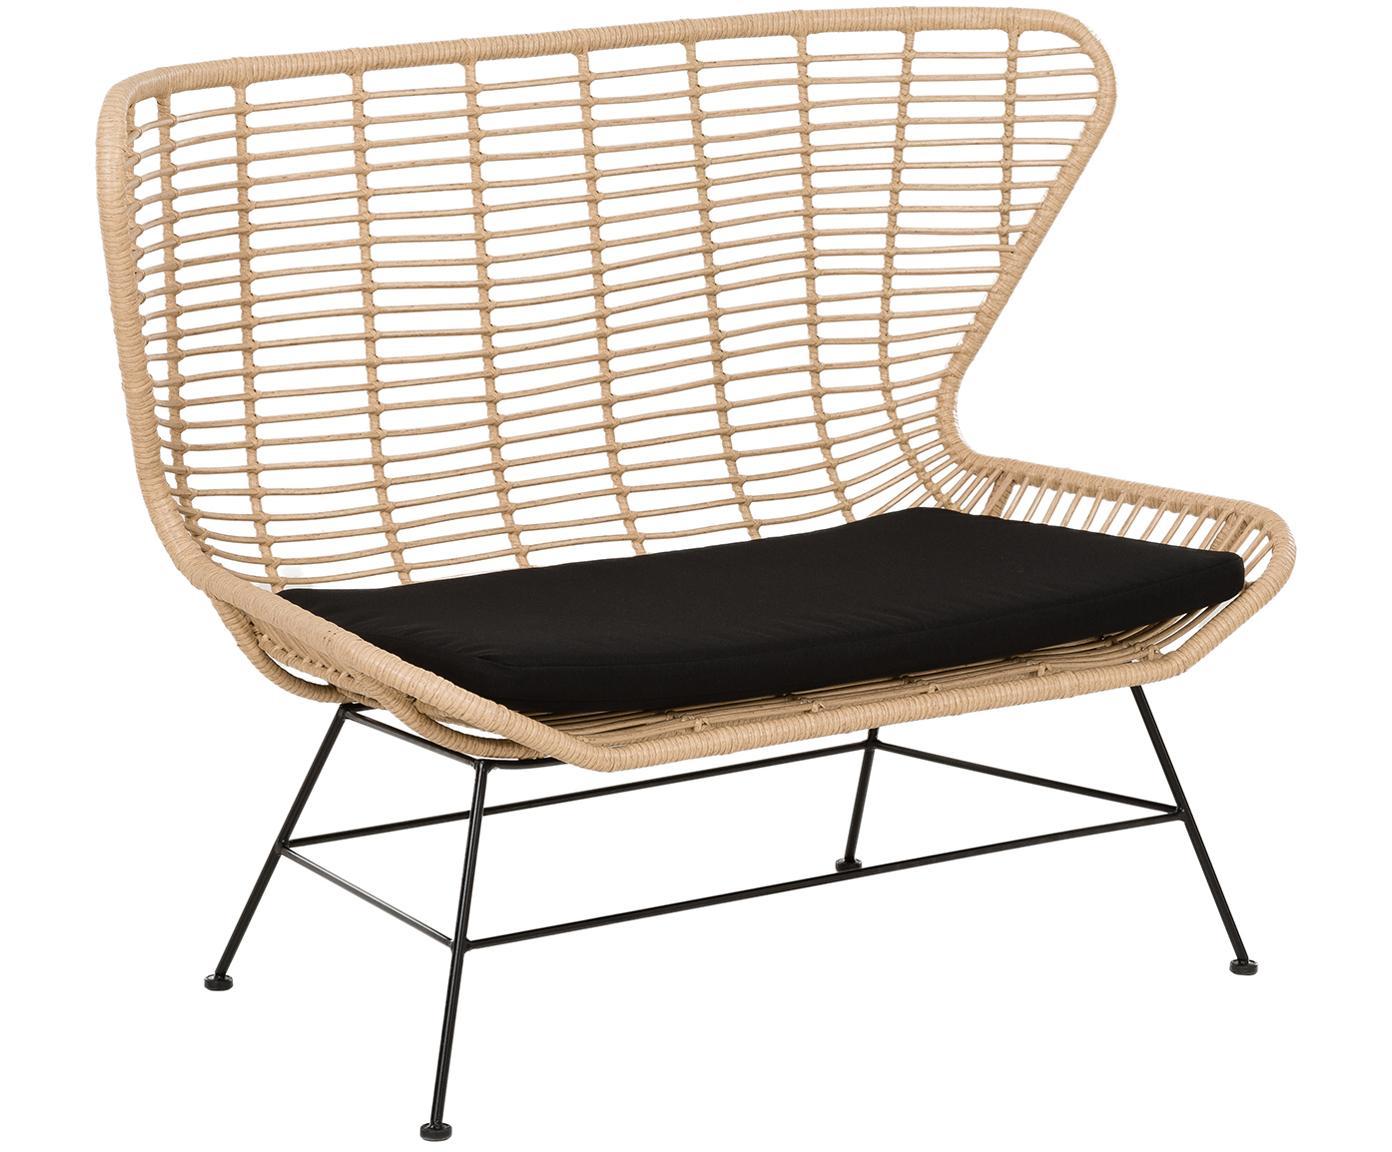 Garten-Sitzbank Costa mit Polyrattan, Sitzfläche: Polyethylen-Geflecht, Gestell: Metall, pulverbeschichtet, Hellbraun, B 137 x T 73 cm